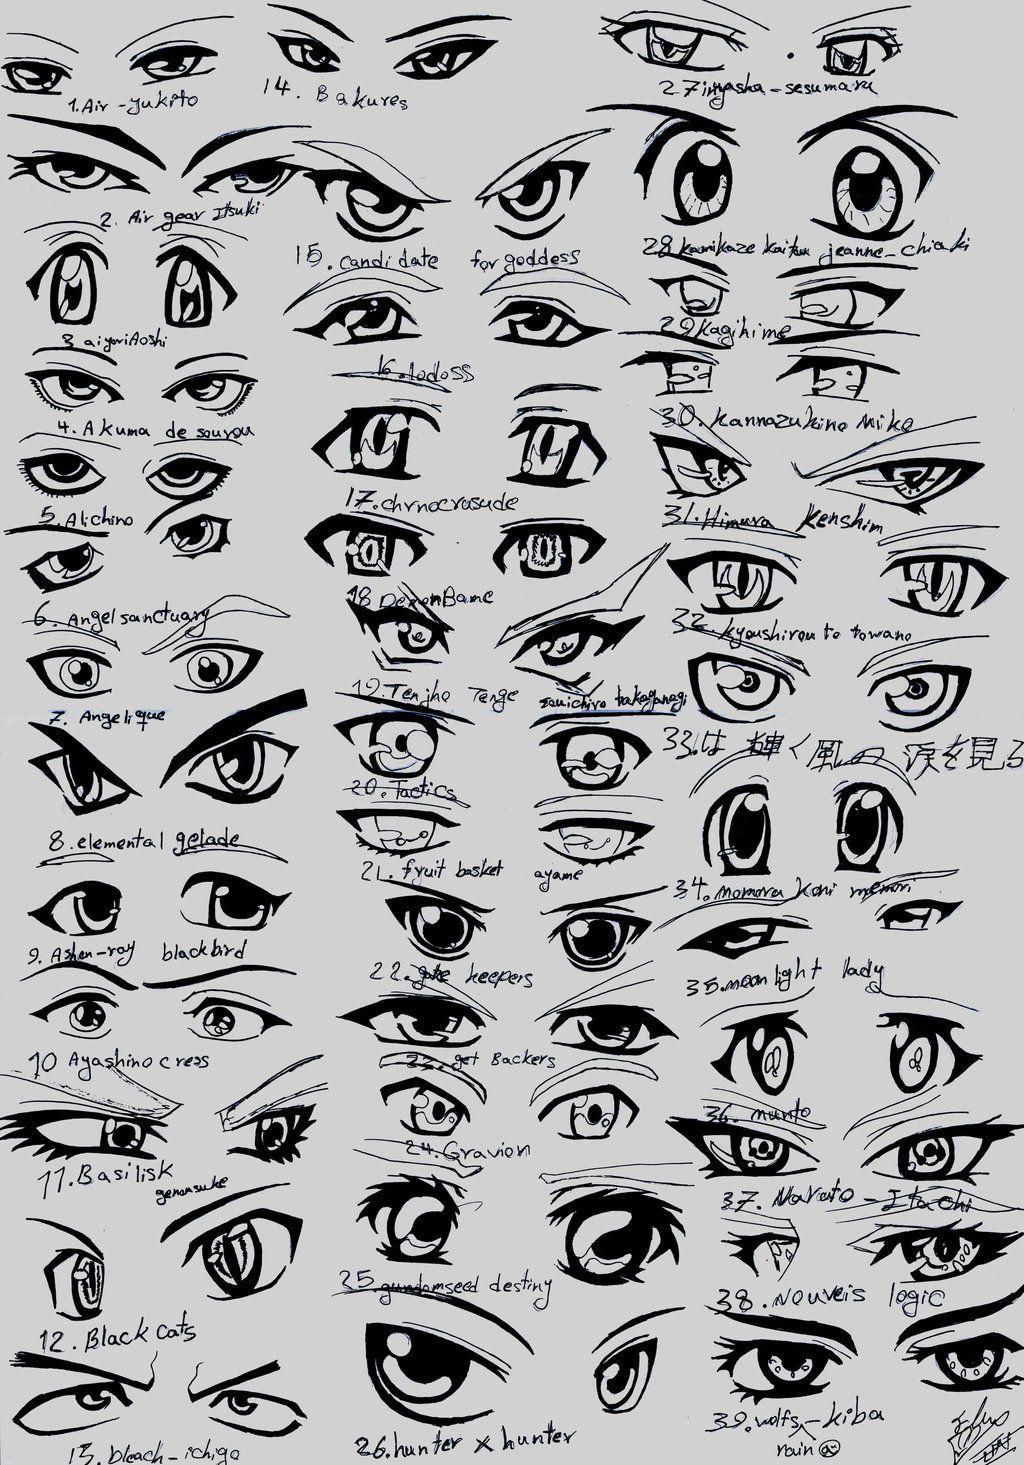 Anime eyes 35 Dibujos de ojos, Dibujar ojos de anime